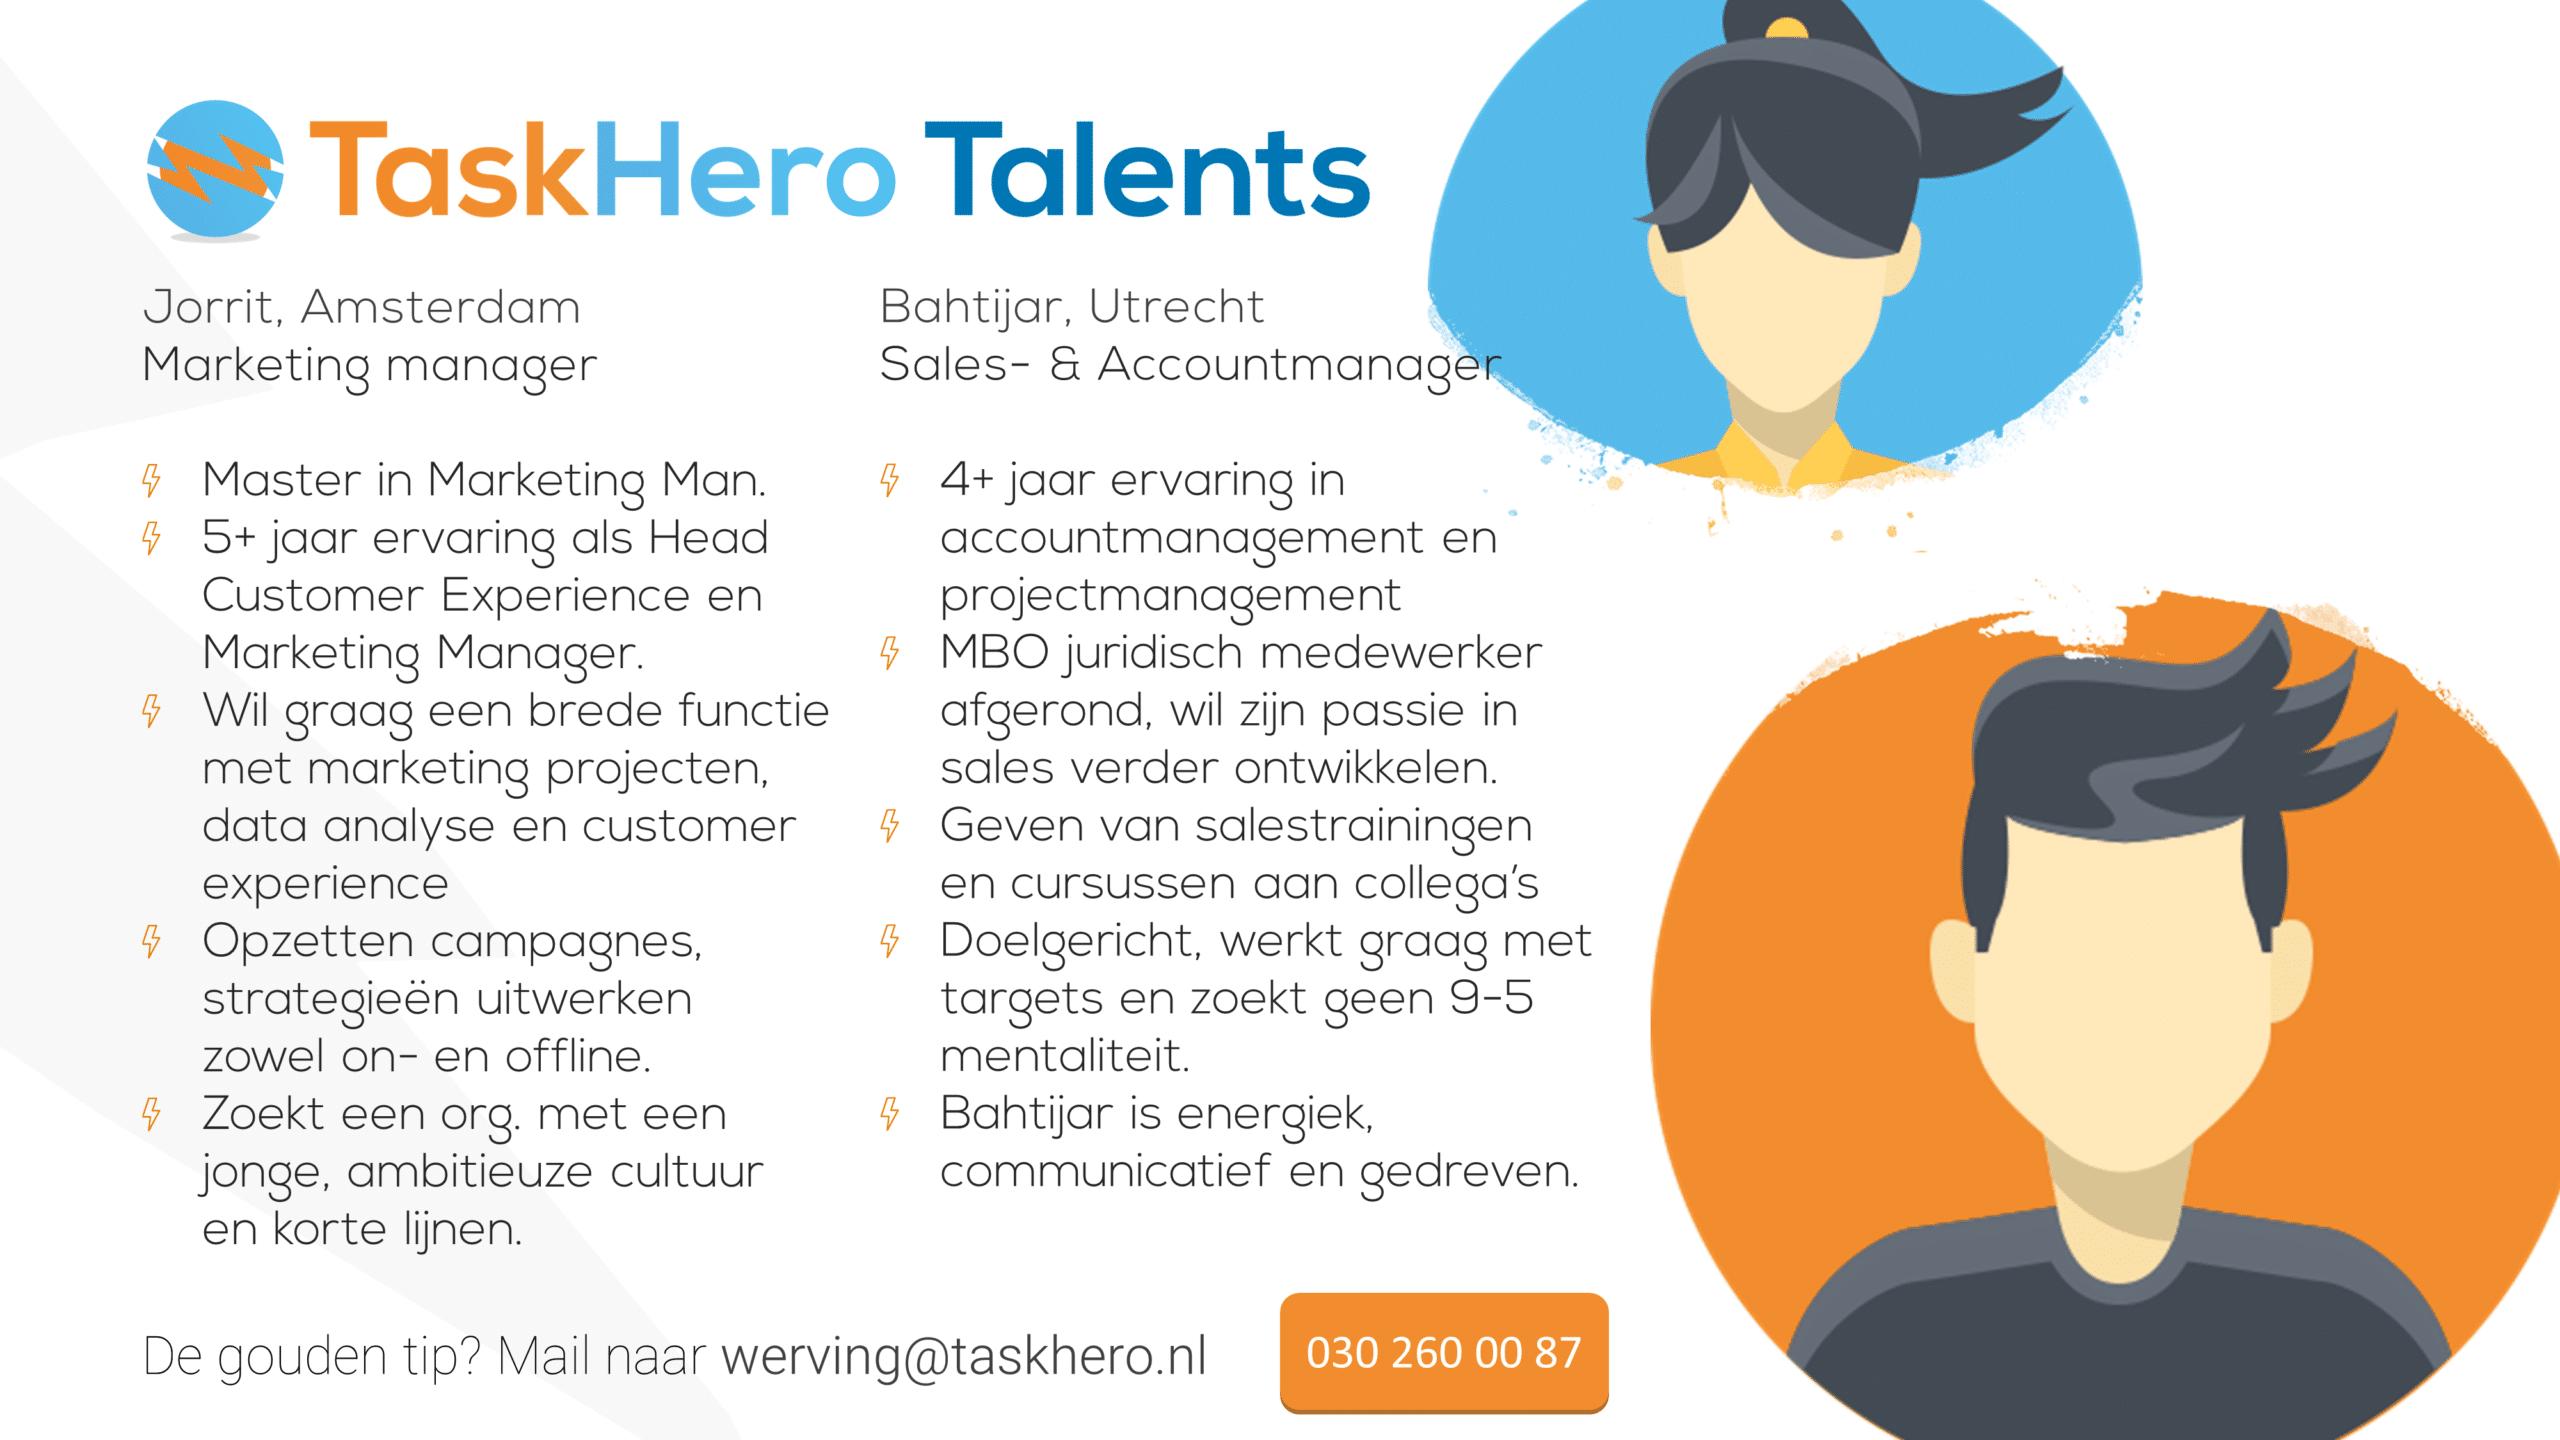 Takhero Talents 27-11-2018